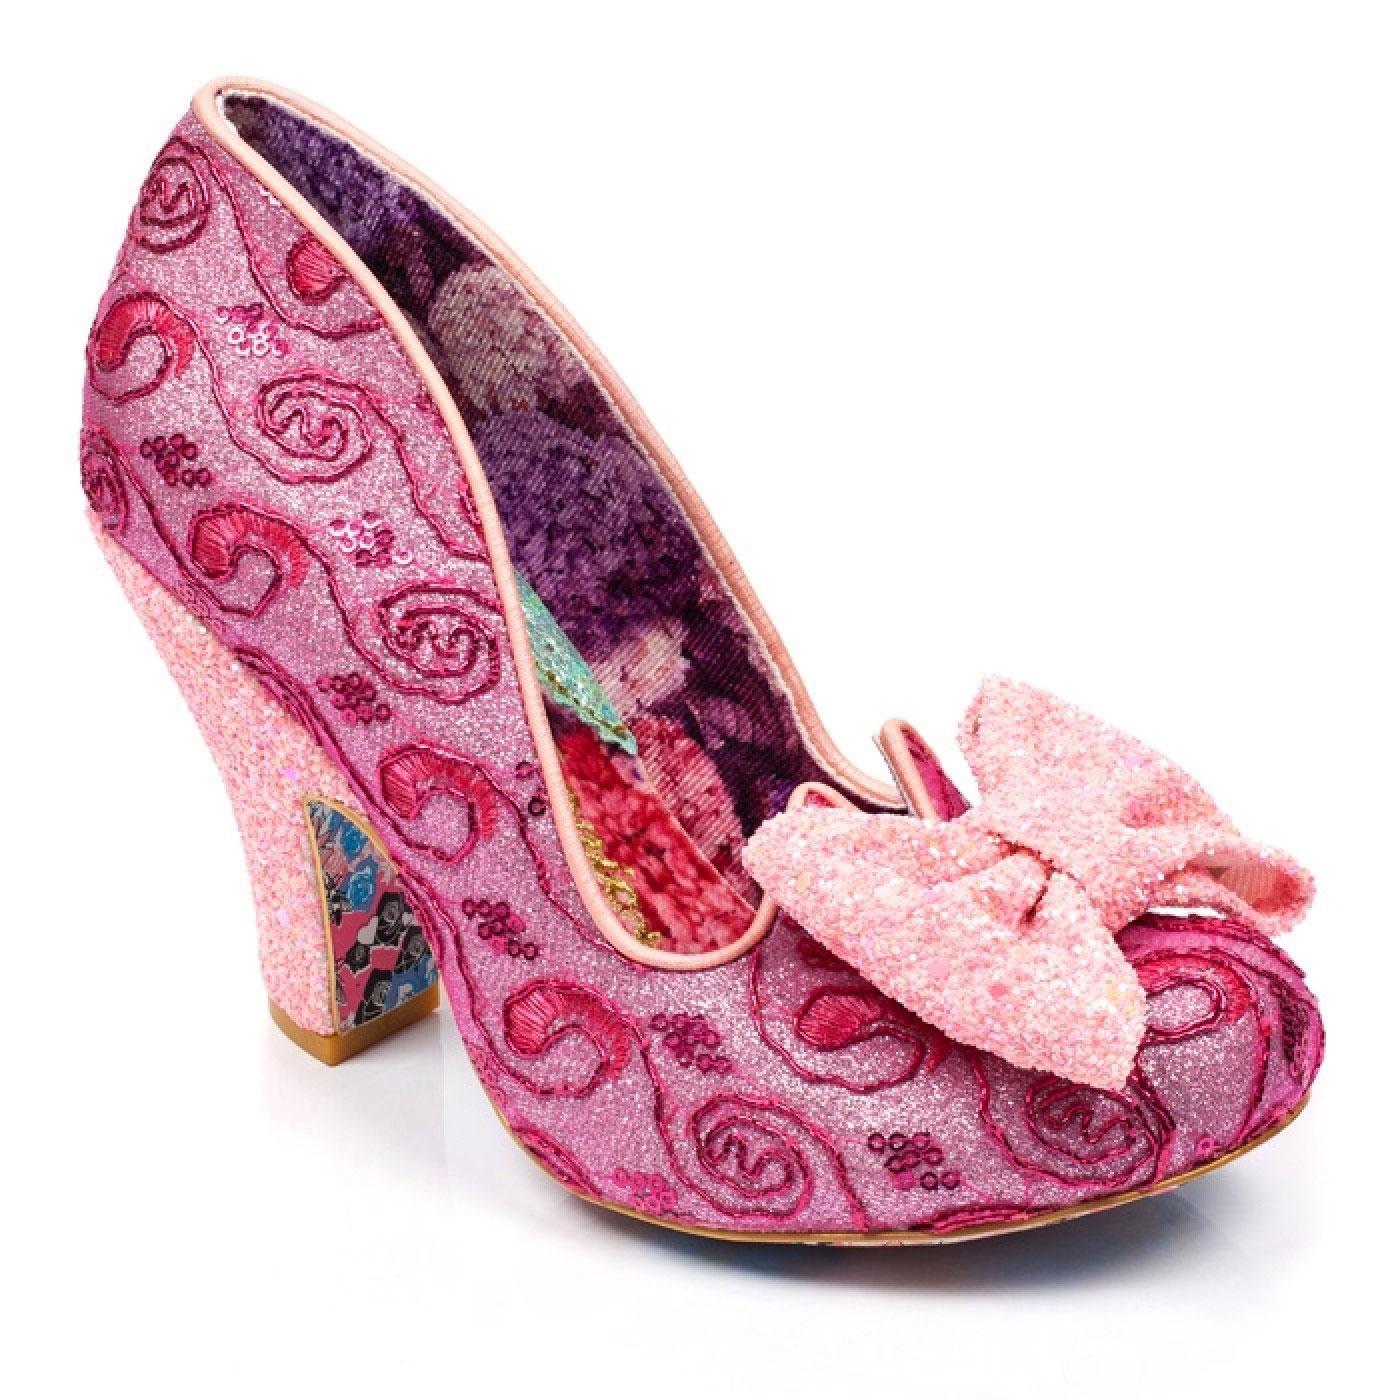 Nick Of Time IRREGULAR CHOICE Vintage Shoes - Pink